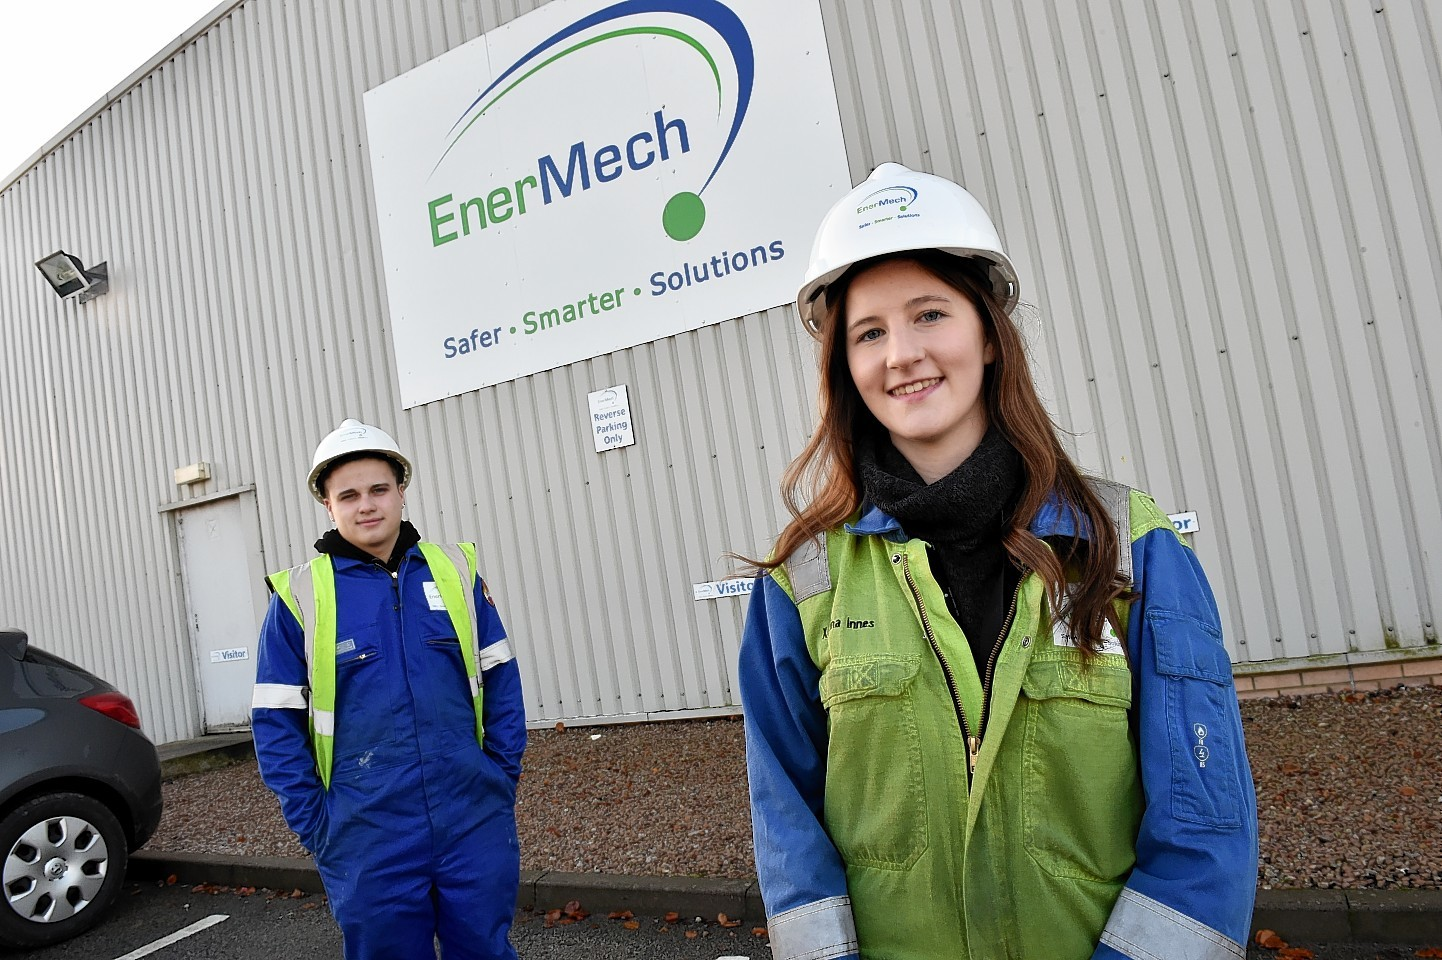 EnerMech apprentices Callum Innes and Katrina Innes. Picture by Colin Rennie